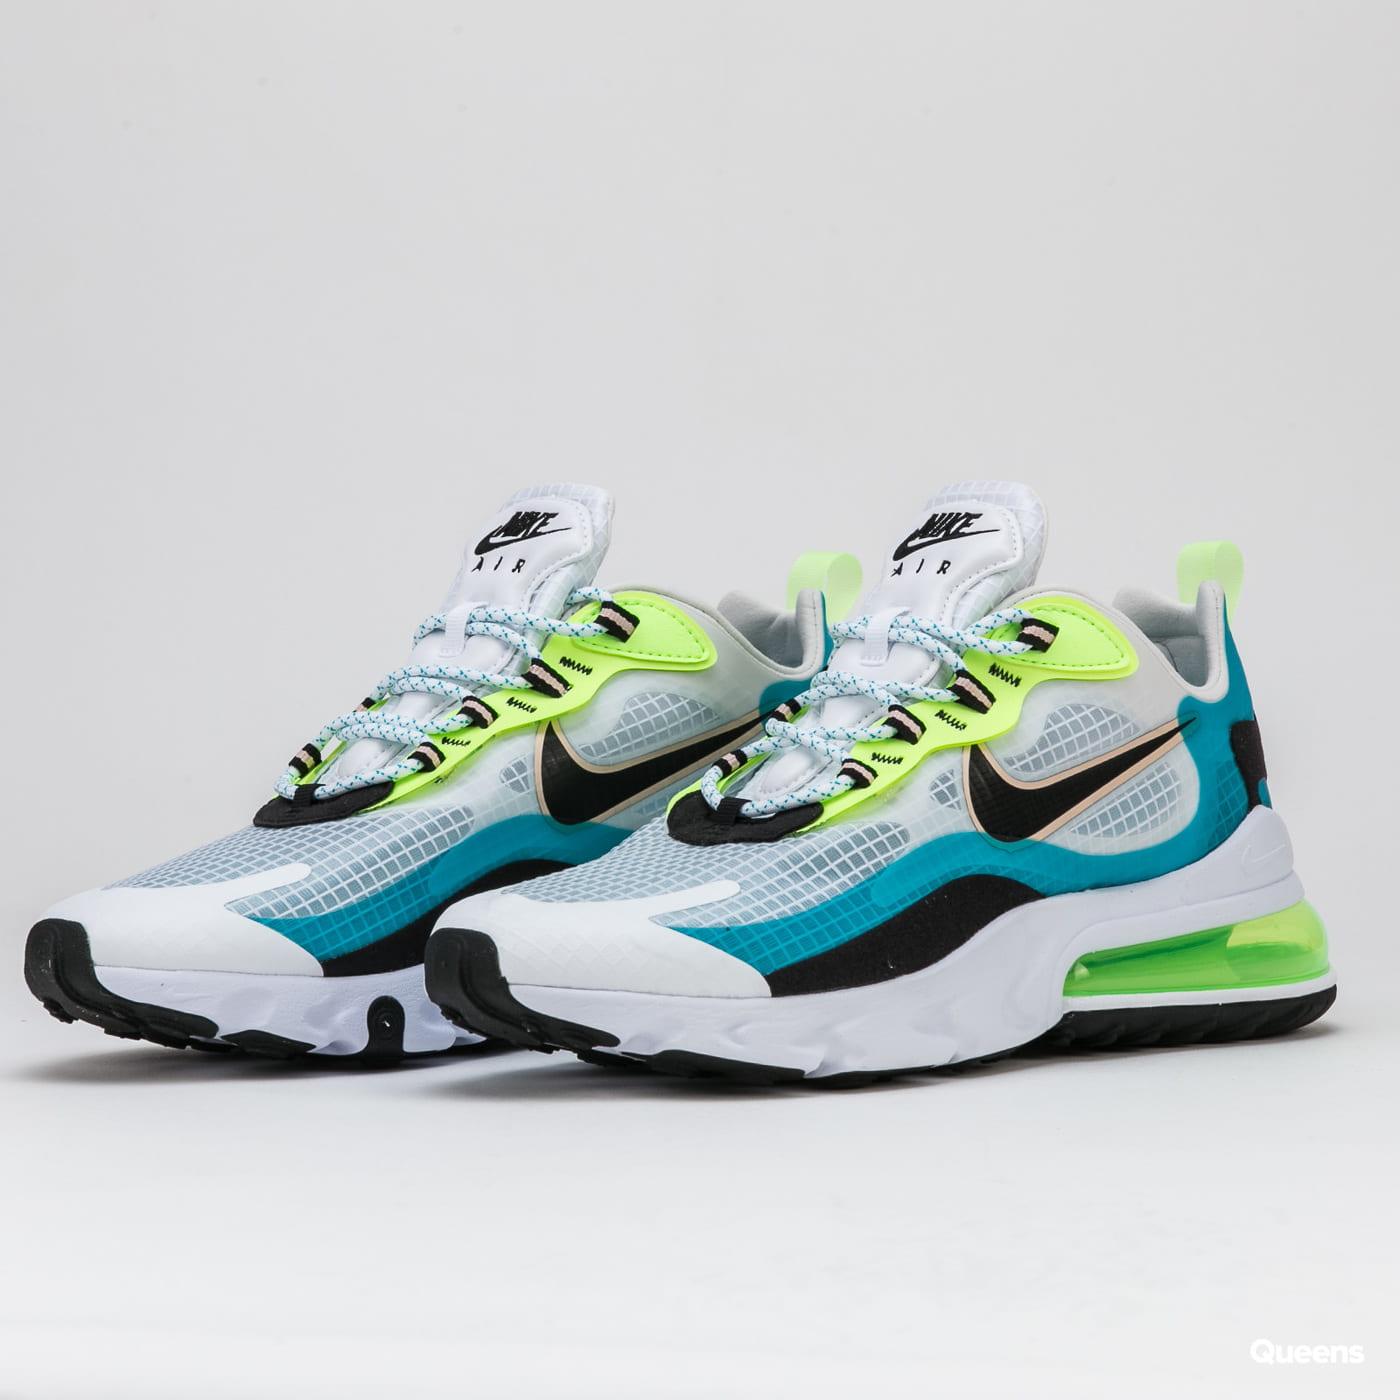 Sneakers Nike Air Max 270 React Se Ct1265 300 Queens